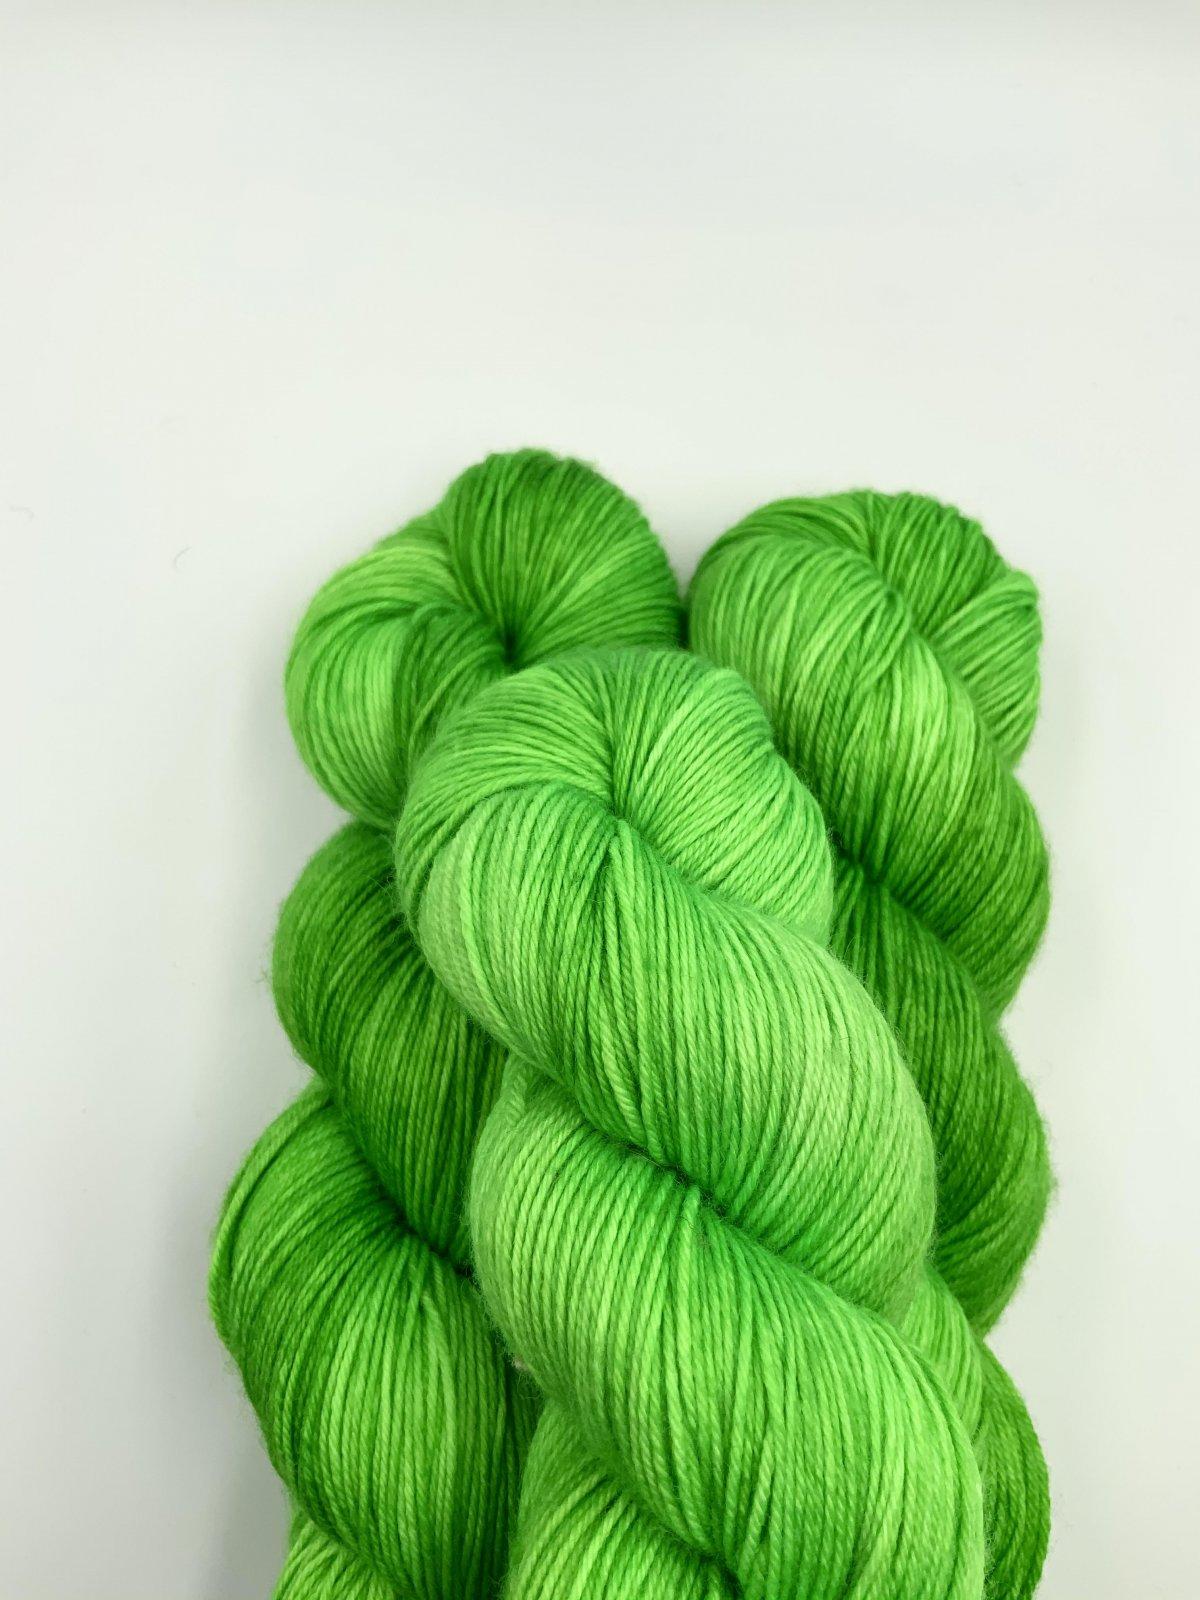 Kleur en Draad Merino 4ply Fingering - Grasshopper